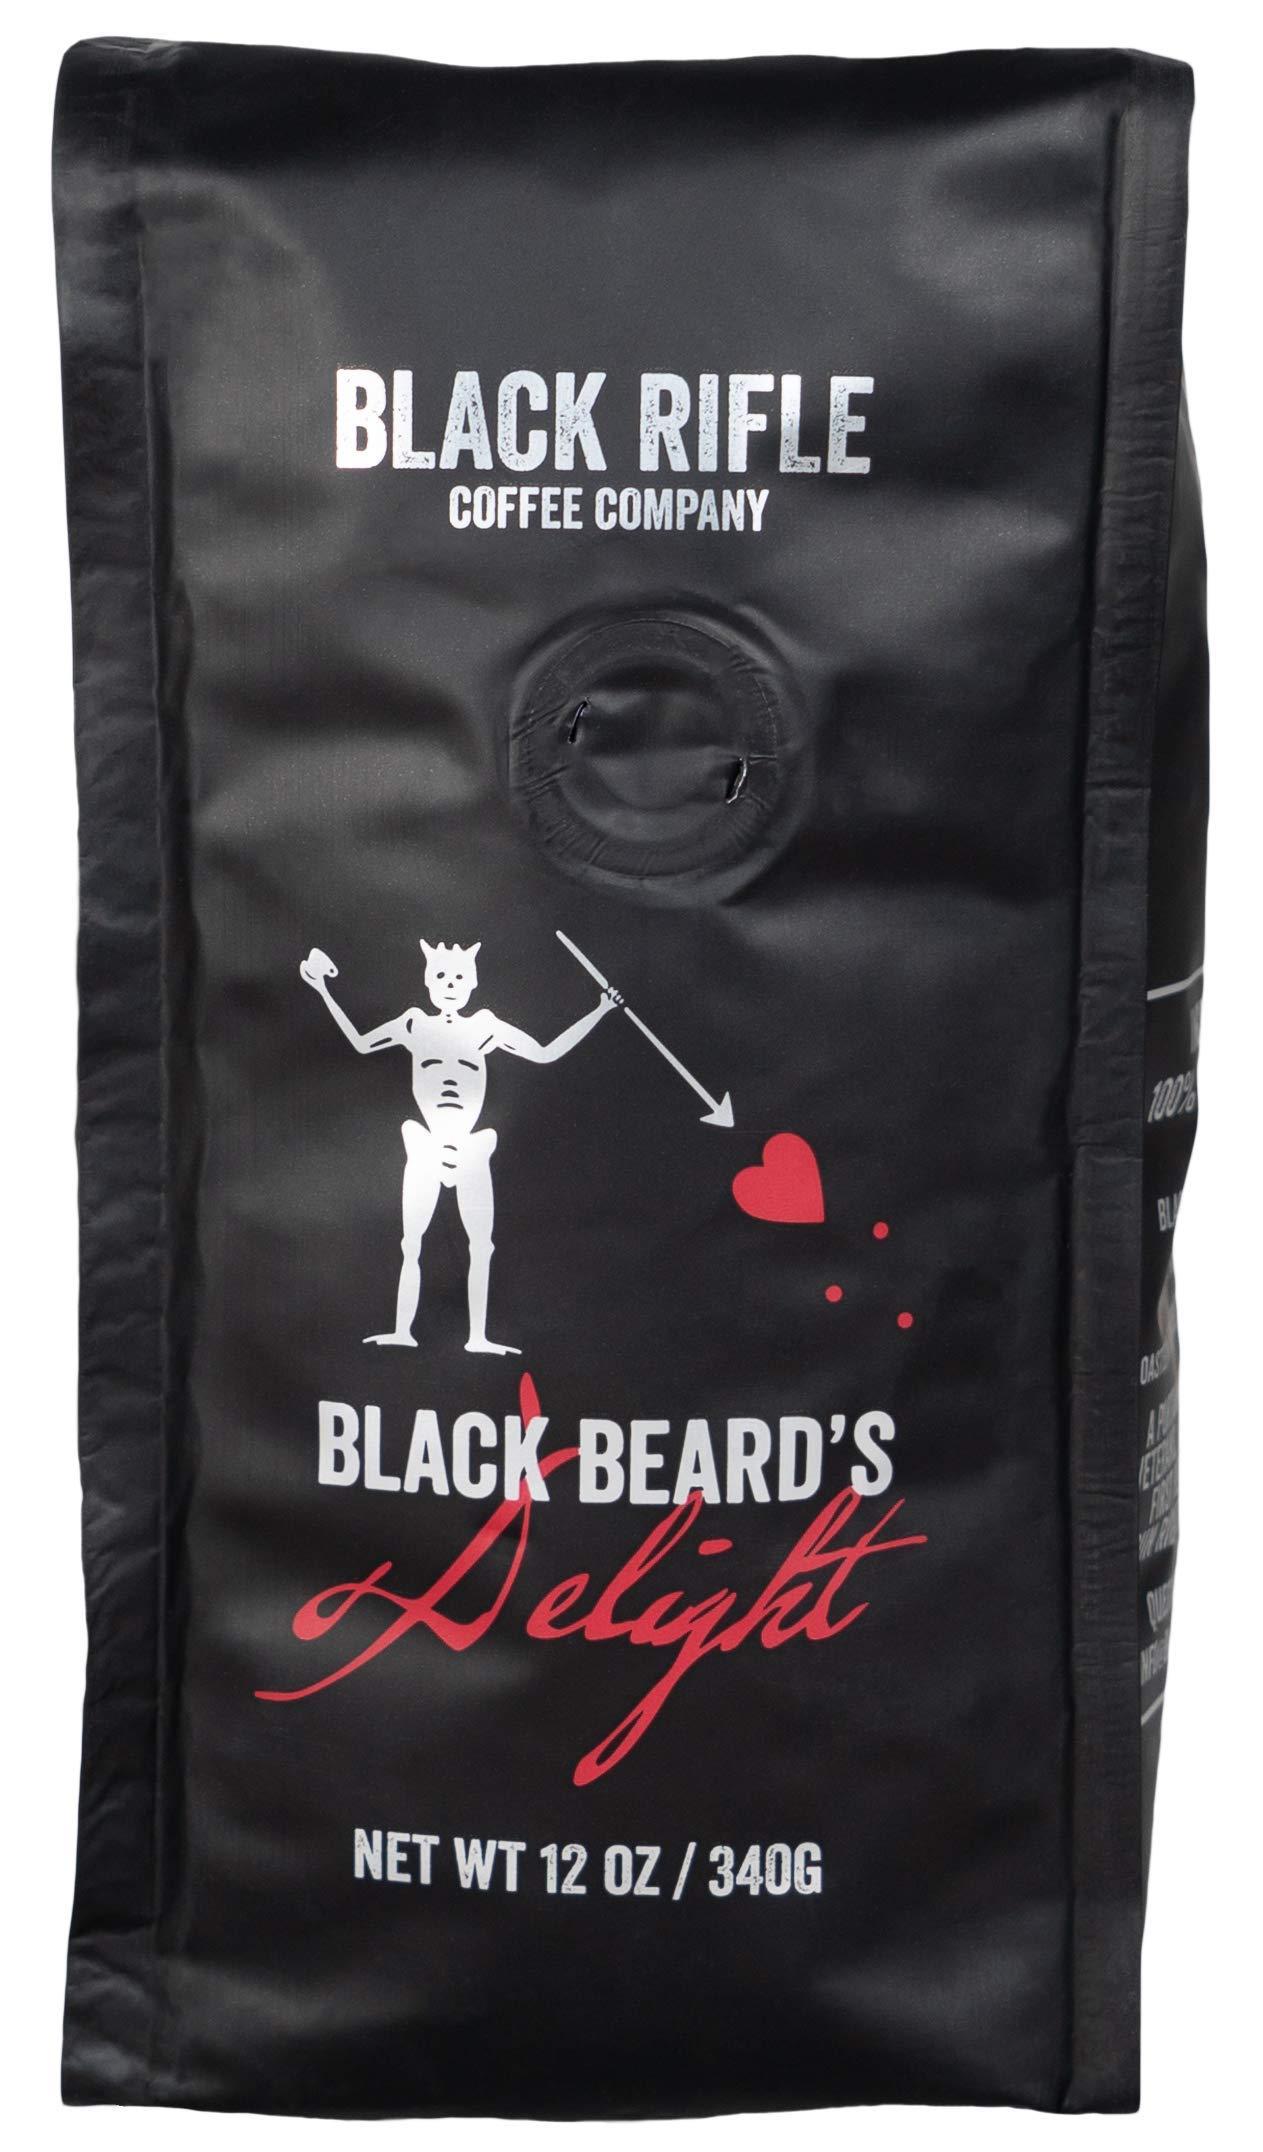 Black Rifle Coffee Company Blackbeard's Delight Coffee Dark Roast Ground, 12 Ounce Bag by Black Rifle Coffee Company (Image #2)